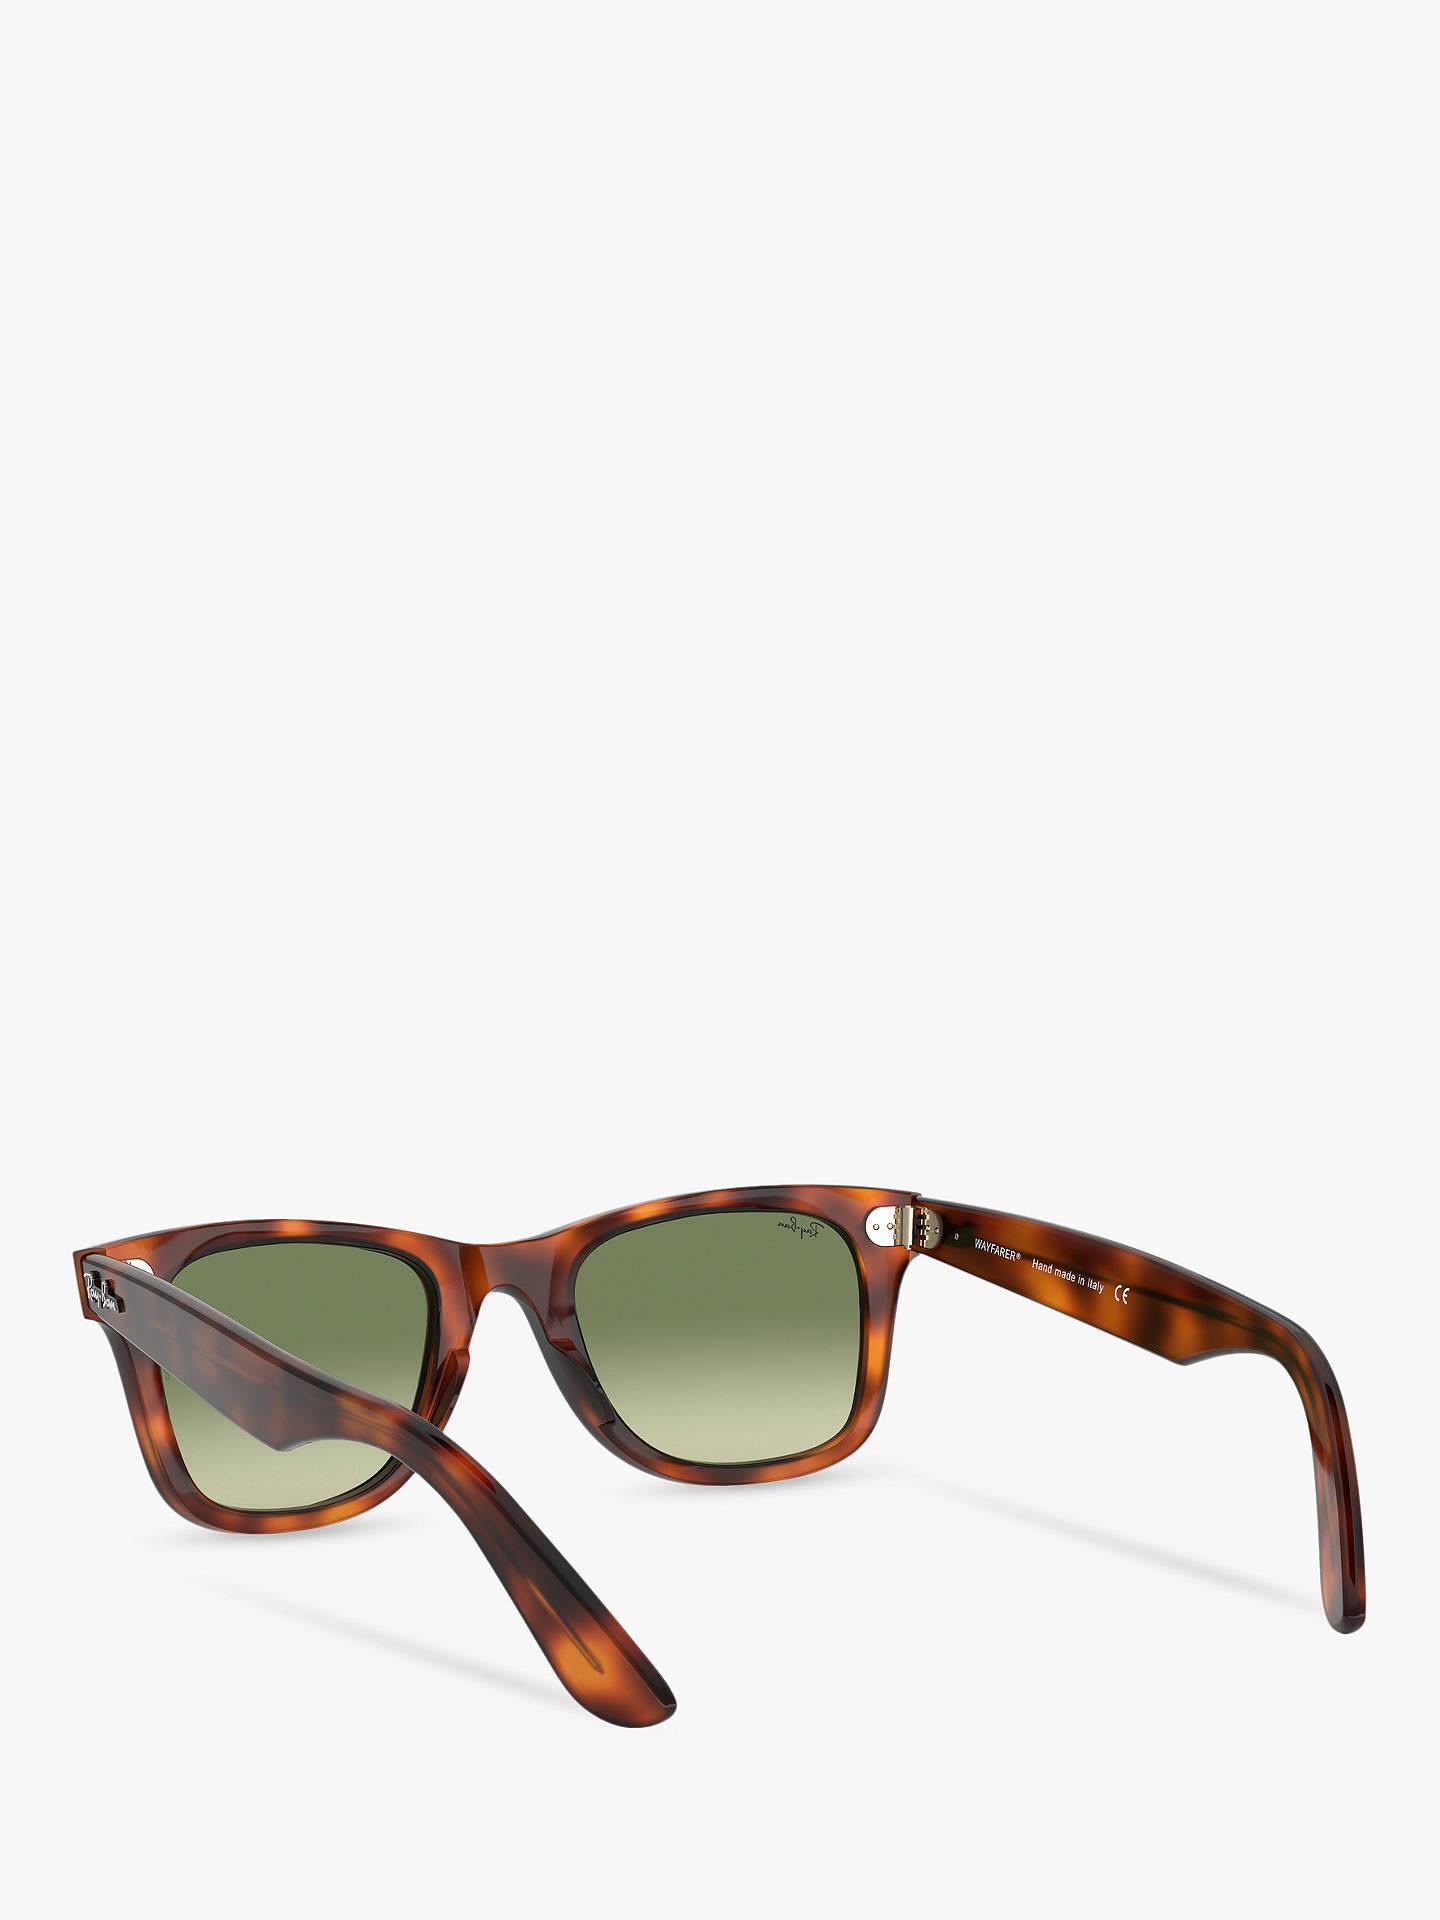 e407306d44b ... Buy Ray-Ban RB4340 Wayfarer Sunglasses